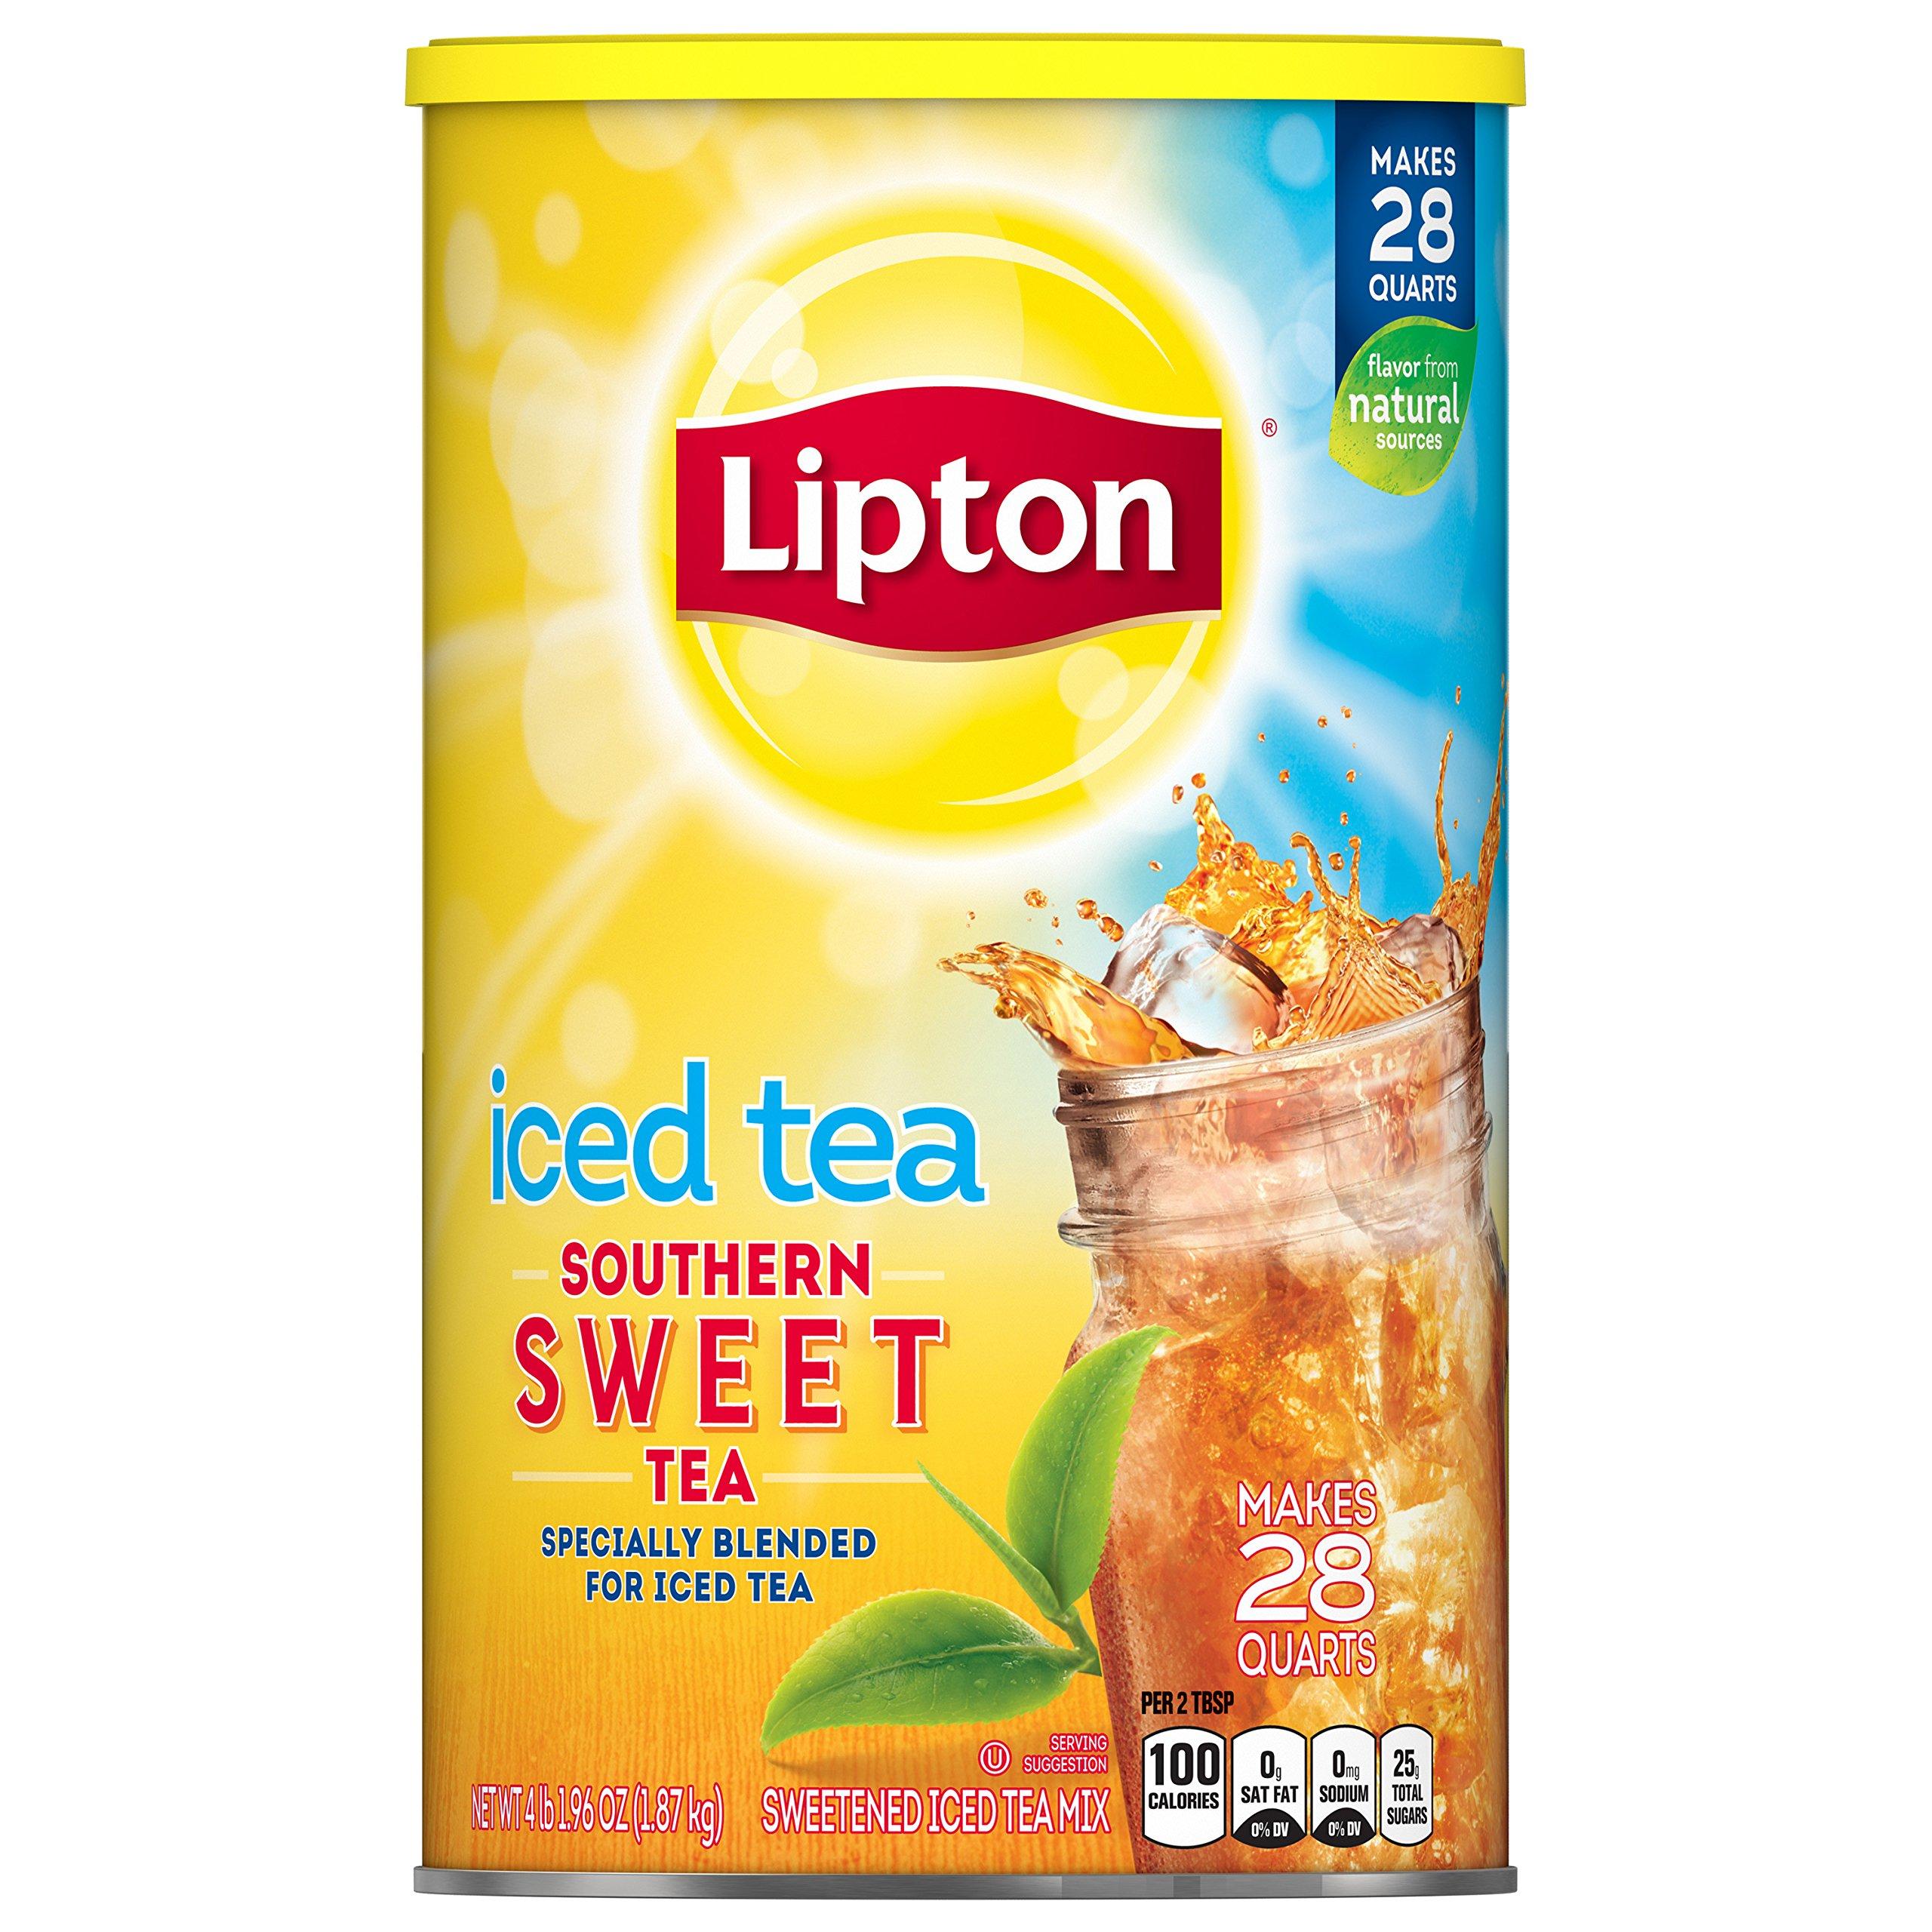 Lipton Iced Tea Mix Southern Sweet Tea, 28 qt, 1 Count